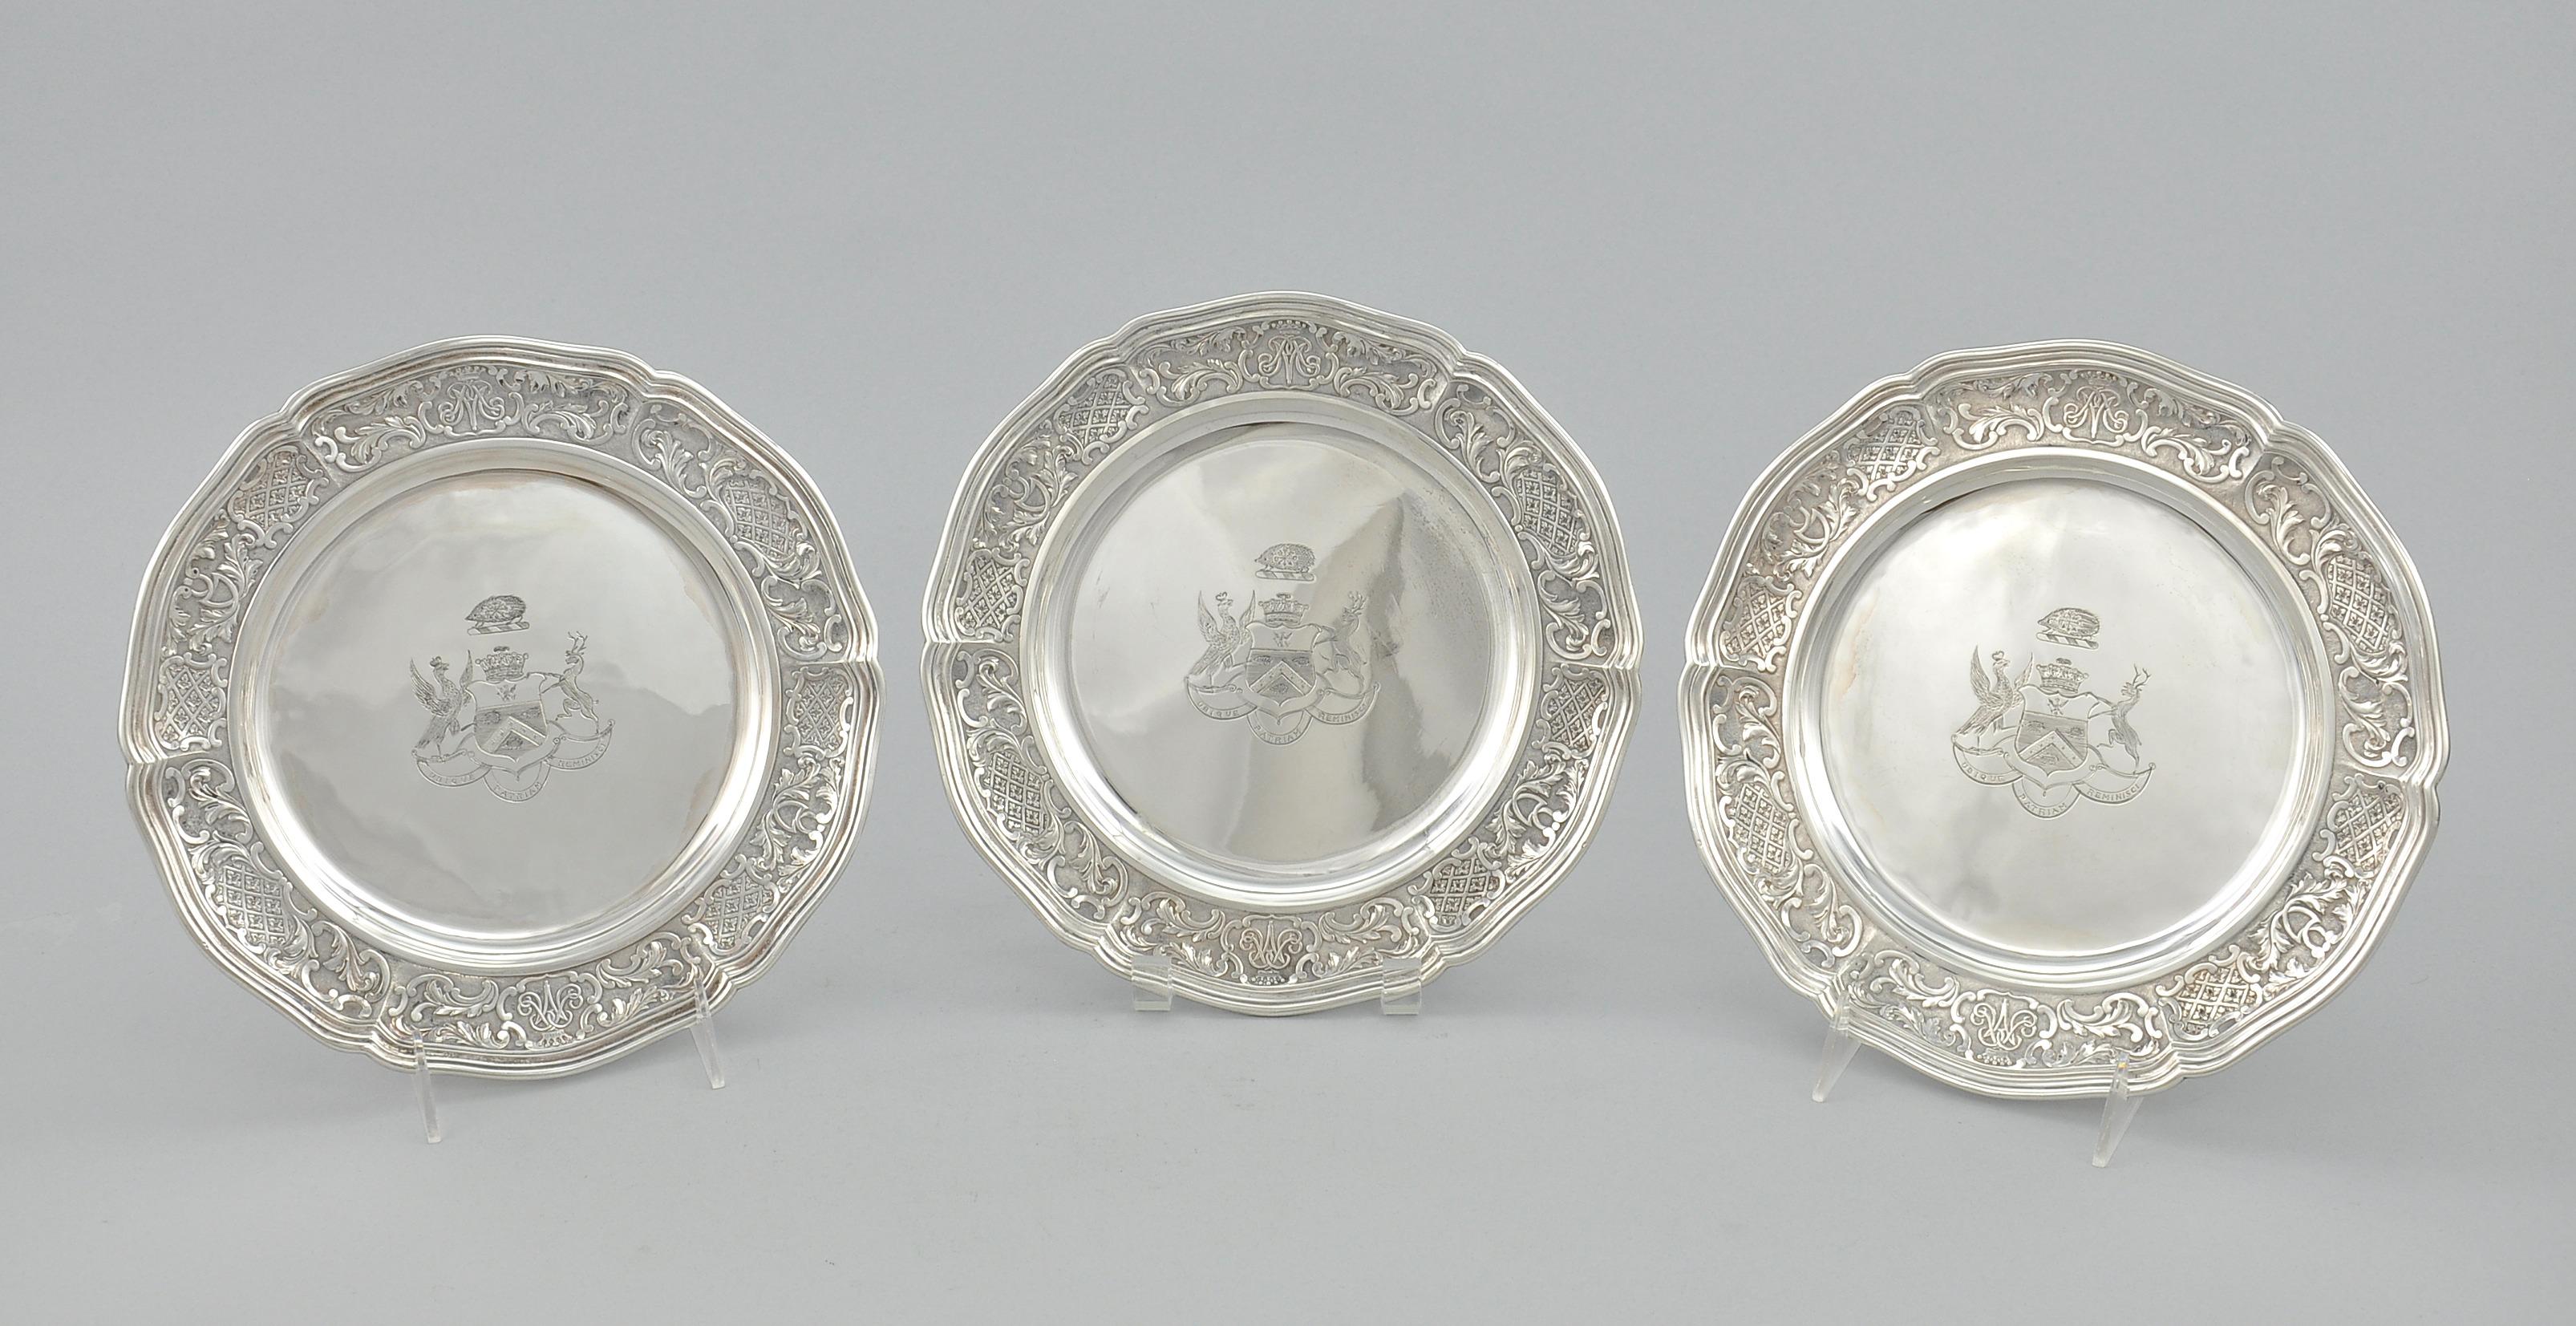 Three Armorial Sterling Silver Plates Storr u0026 Mortimer ca. & Three Armorial Sterling Silver Plates Storr u0026 Mortimer ca. 1834-35 ...